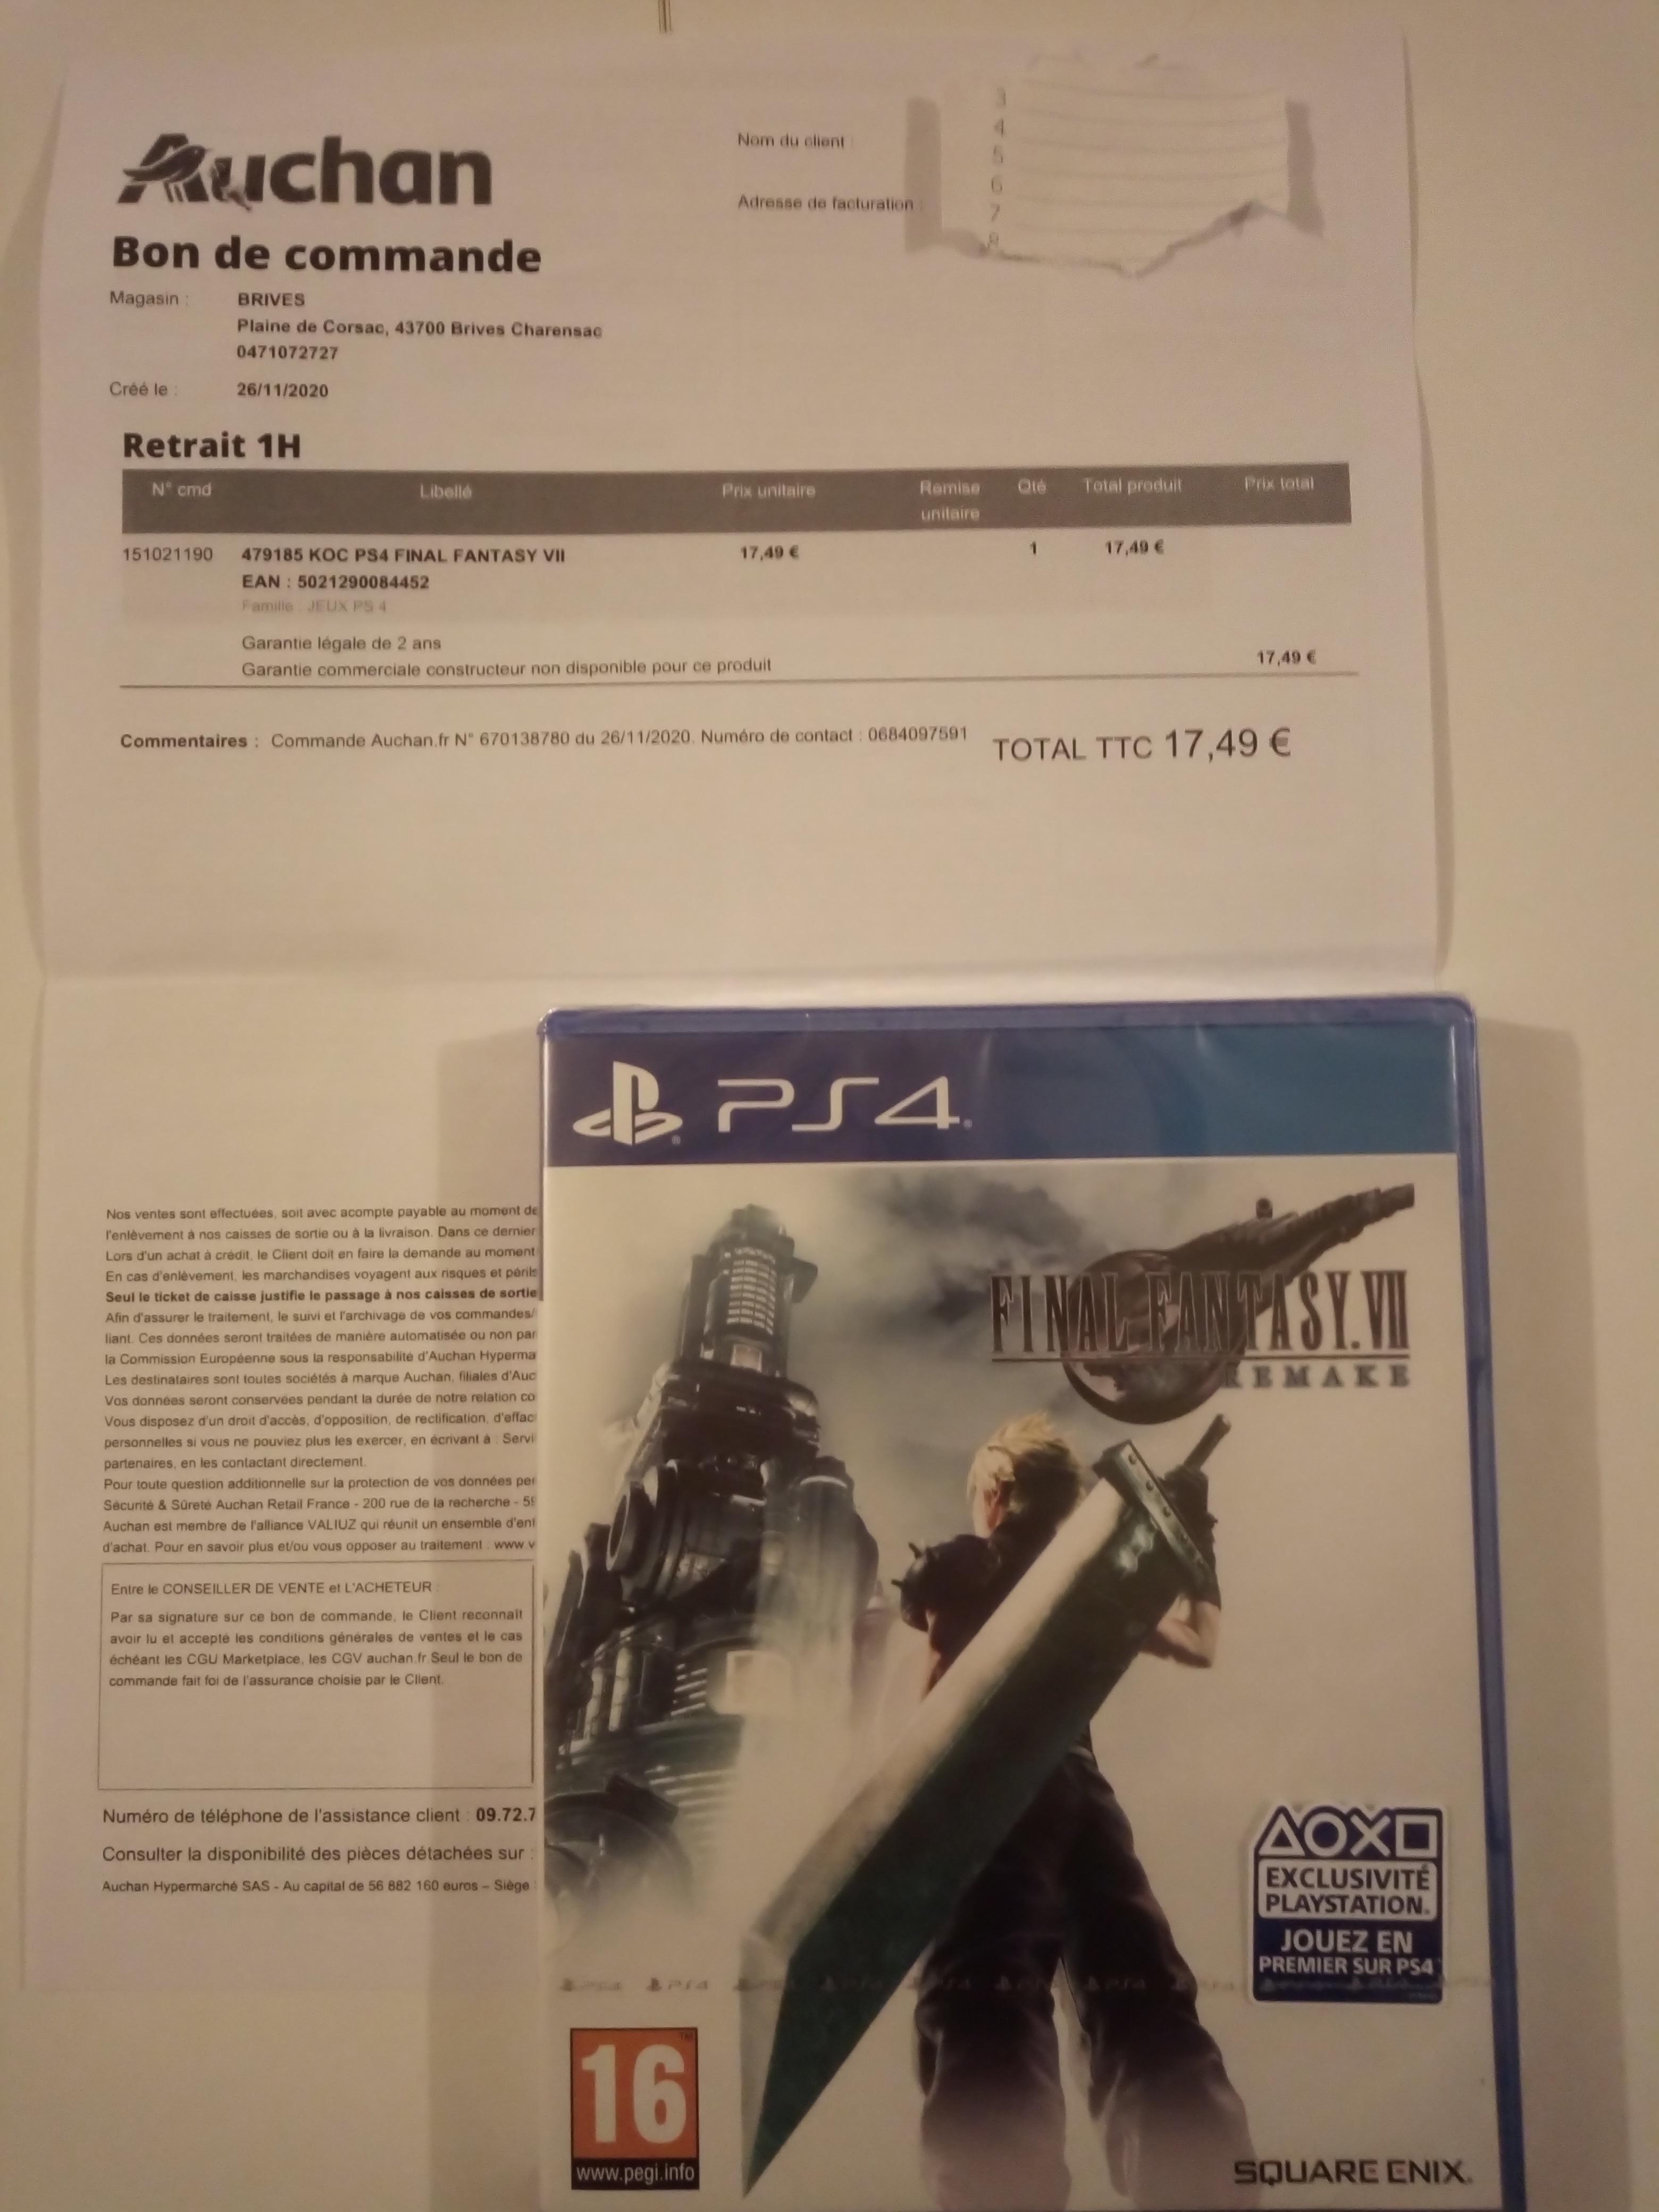 Final Fantasy VII Remake sur PS4 - Auchan Brives Charensac (43), Sarcelles (95)